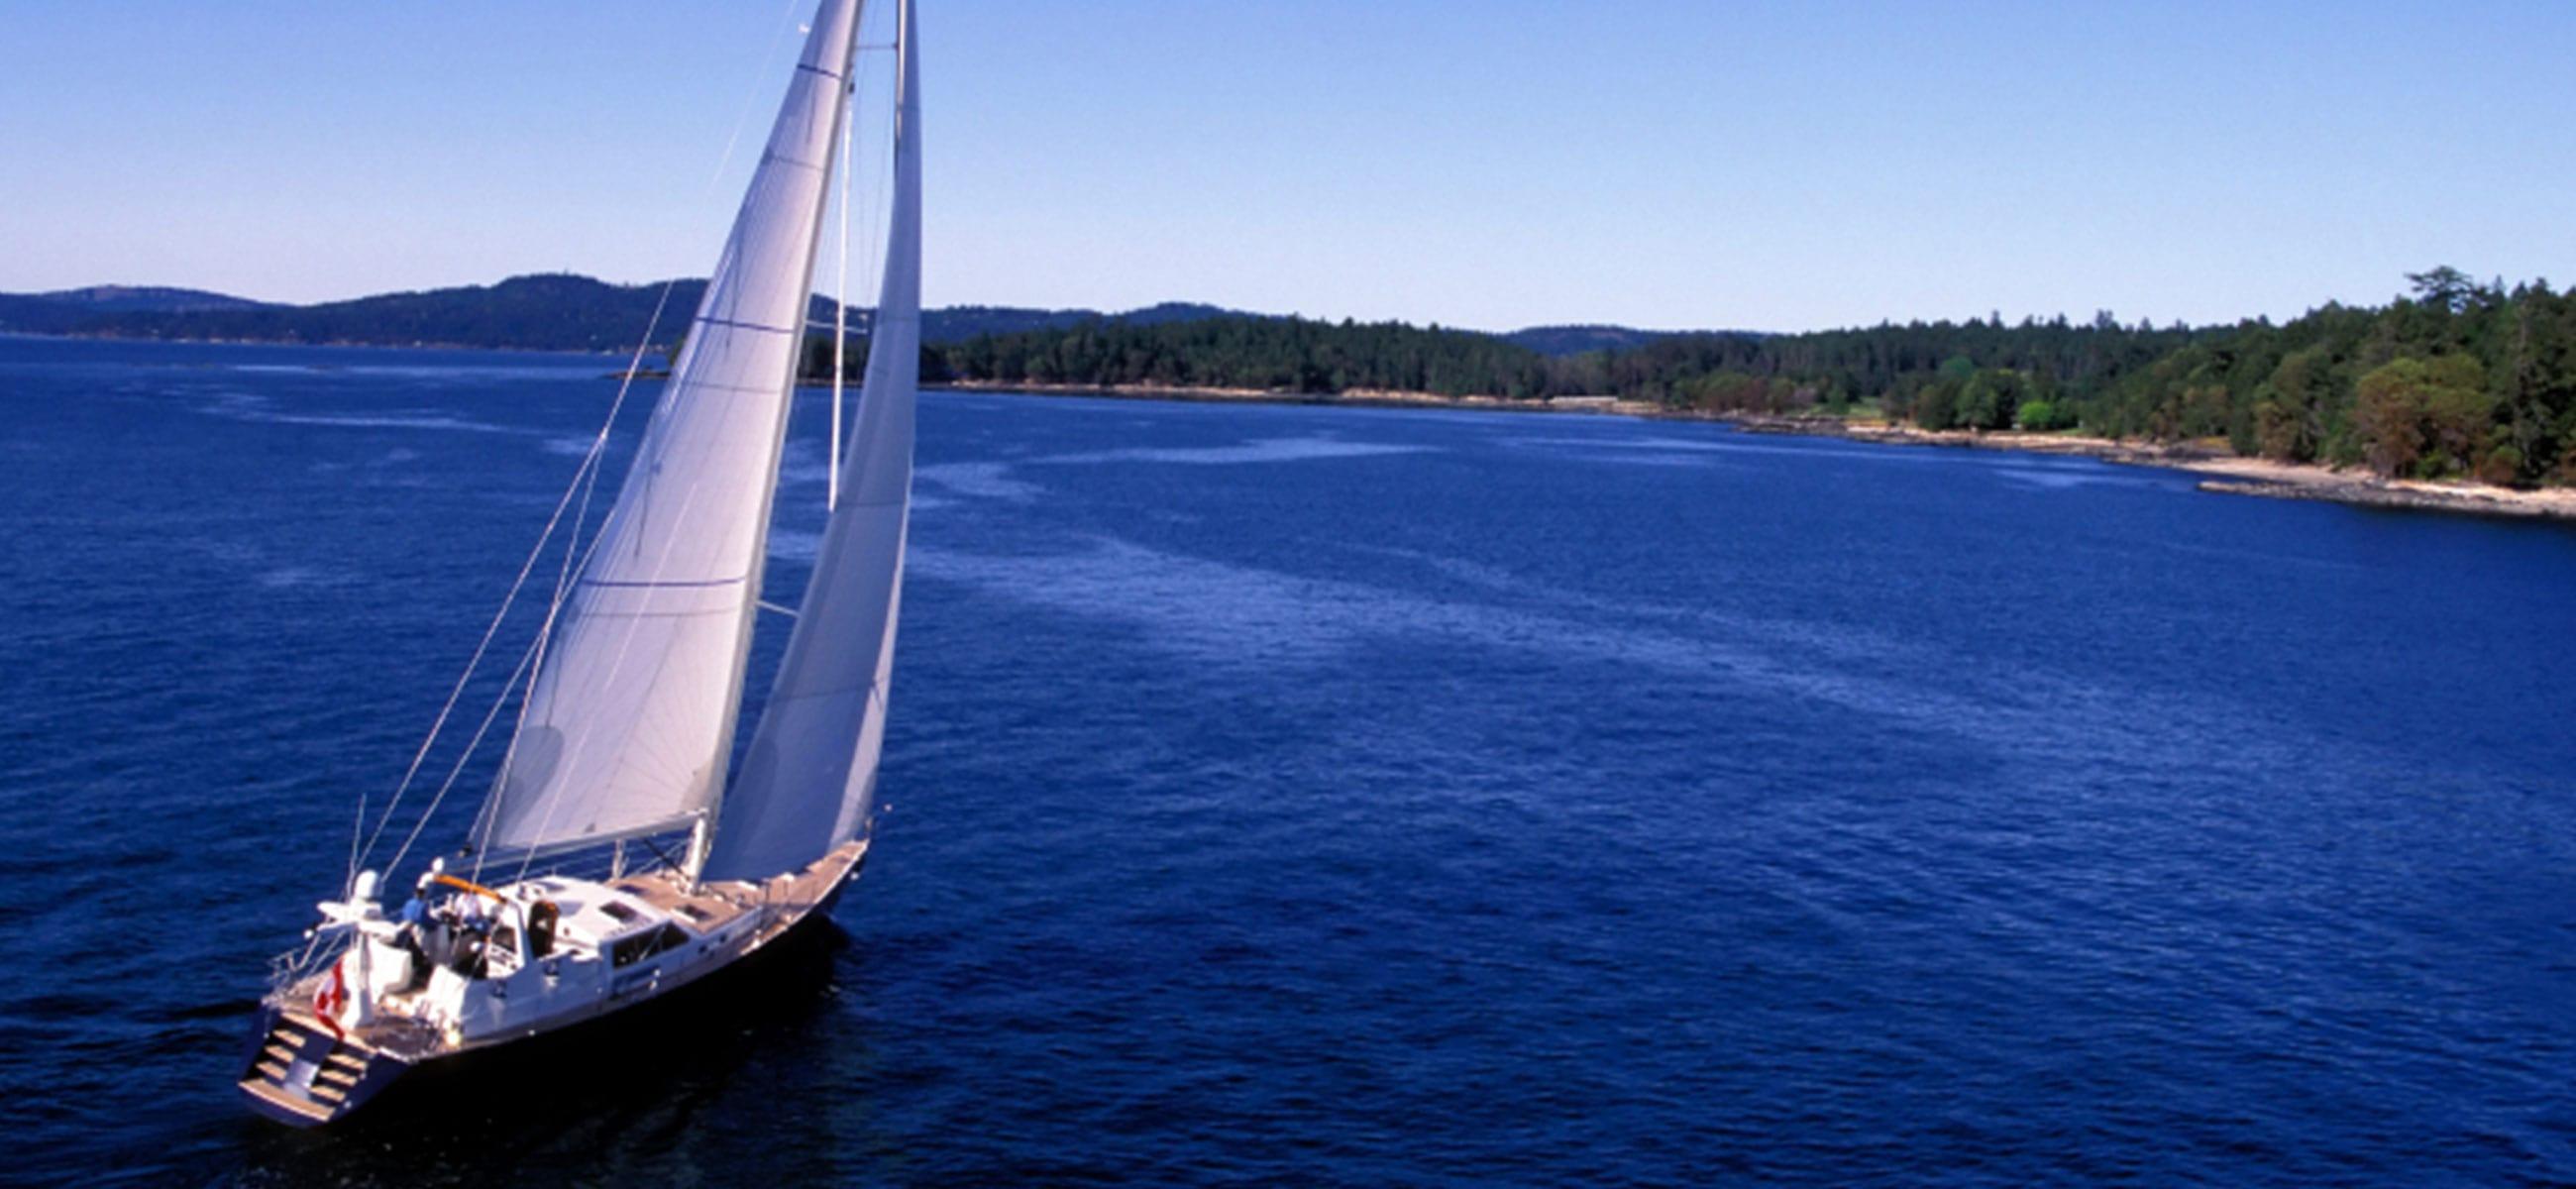 Spartanburg Sc Boat Watercraft Insurance Agents Allsurance Group